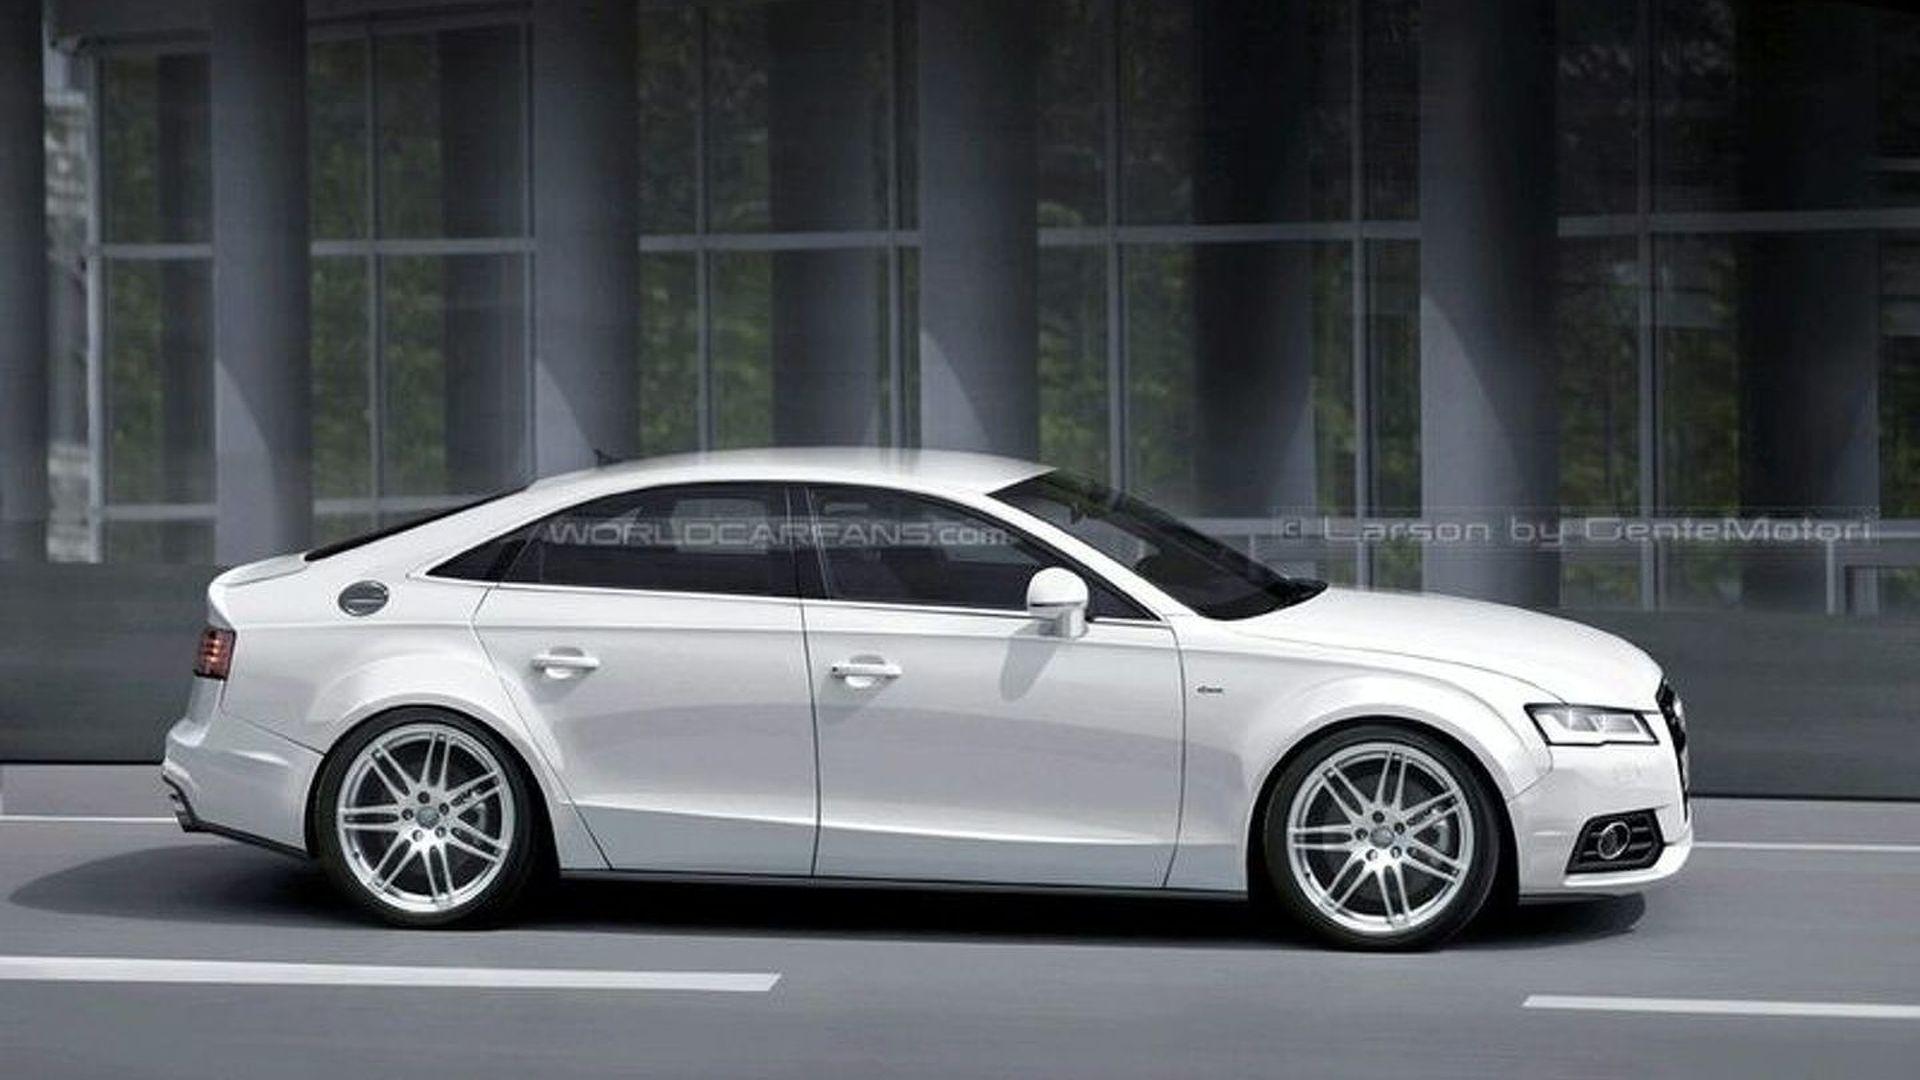 Latest Audi A Renderings Emerge - Larson audi